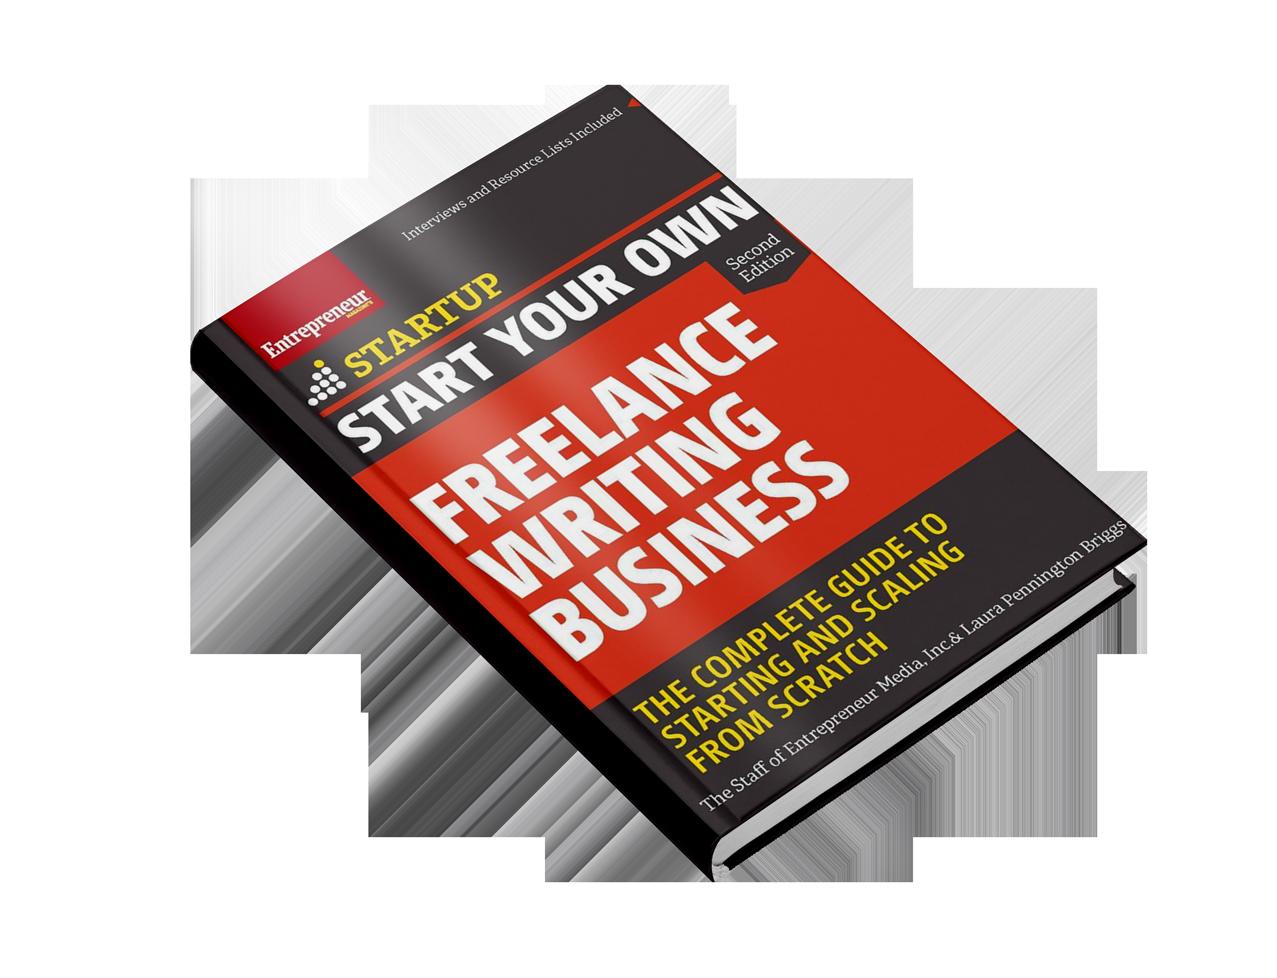 Laura-Pennington-Freelance-Writers-Book.png